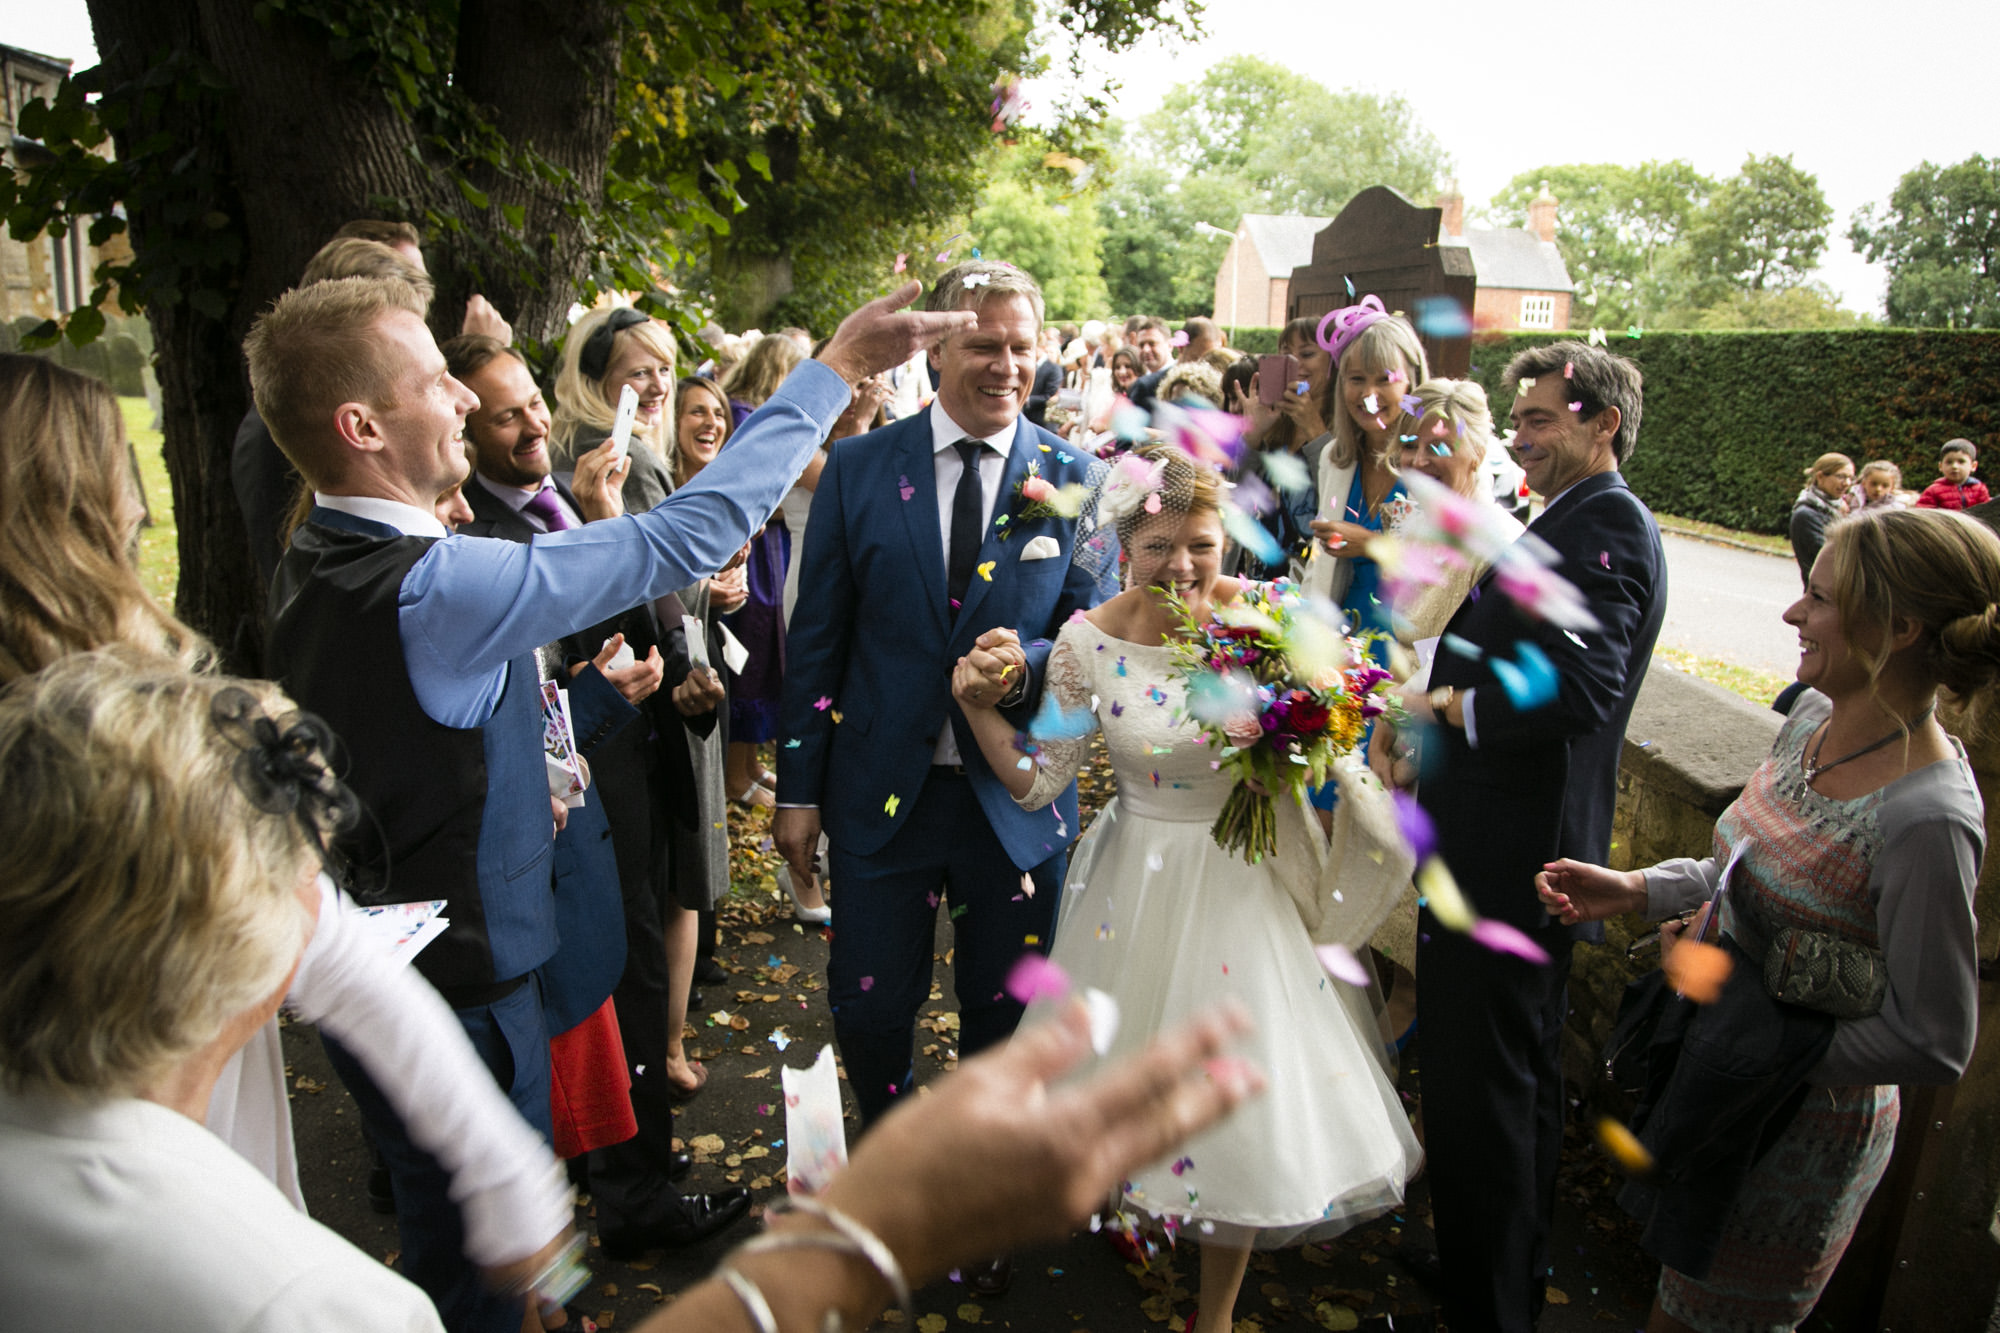 Cambridgeshire Wedding Photographer 1701-277